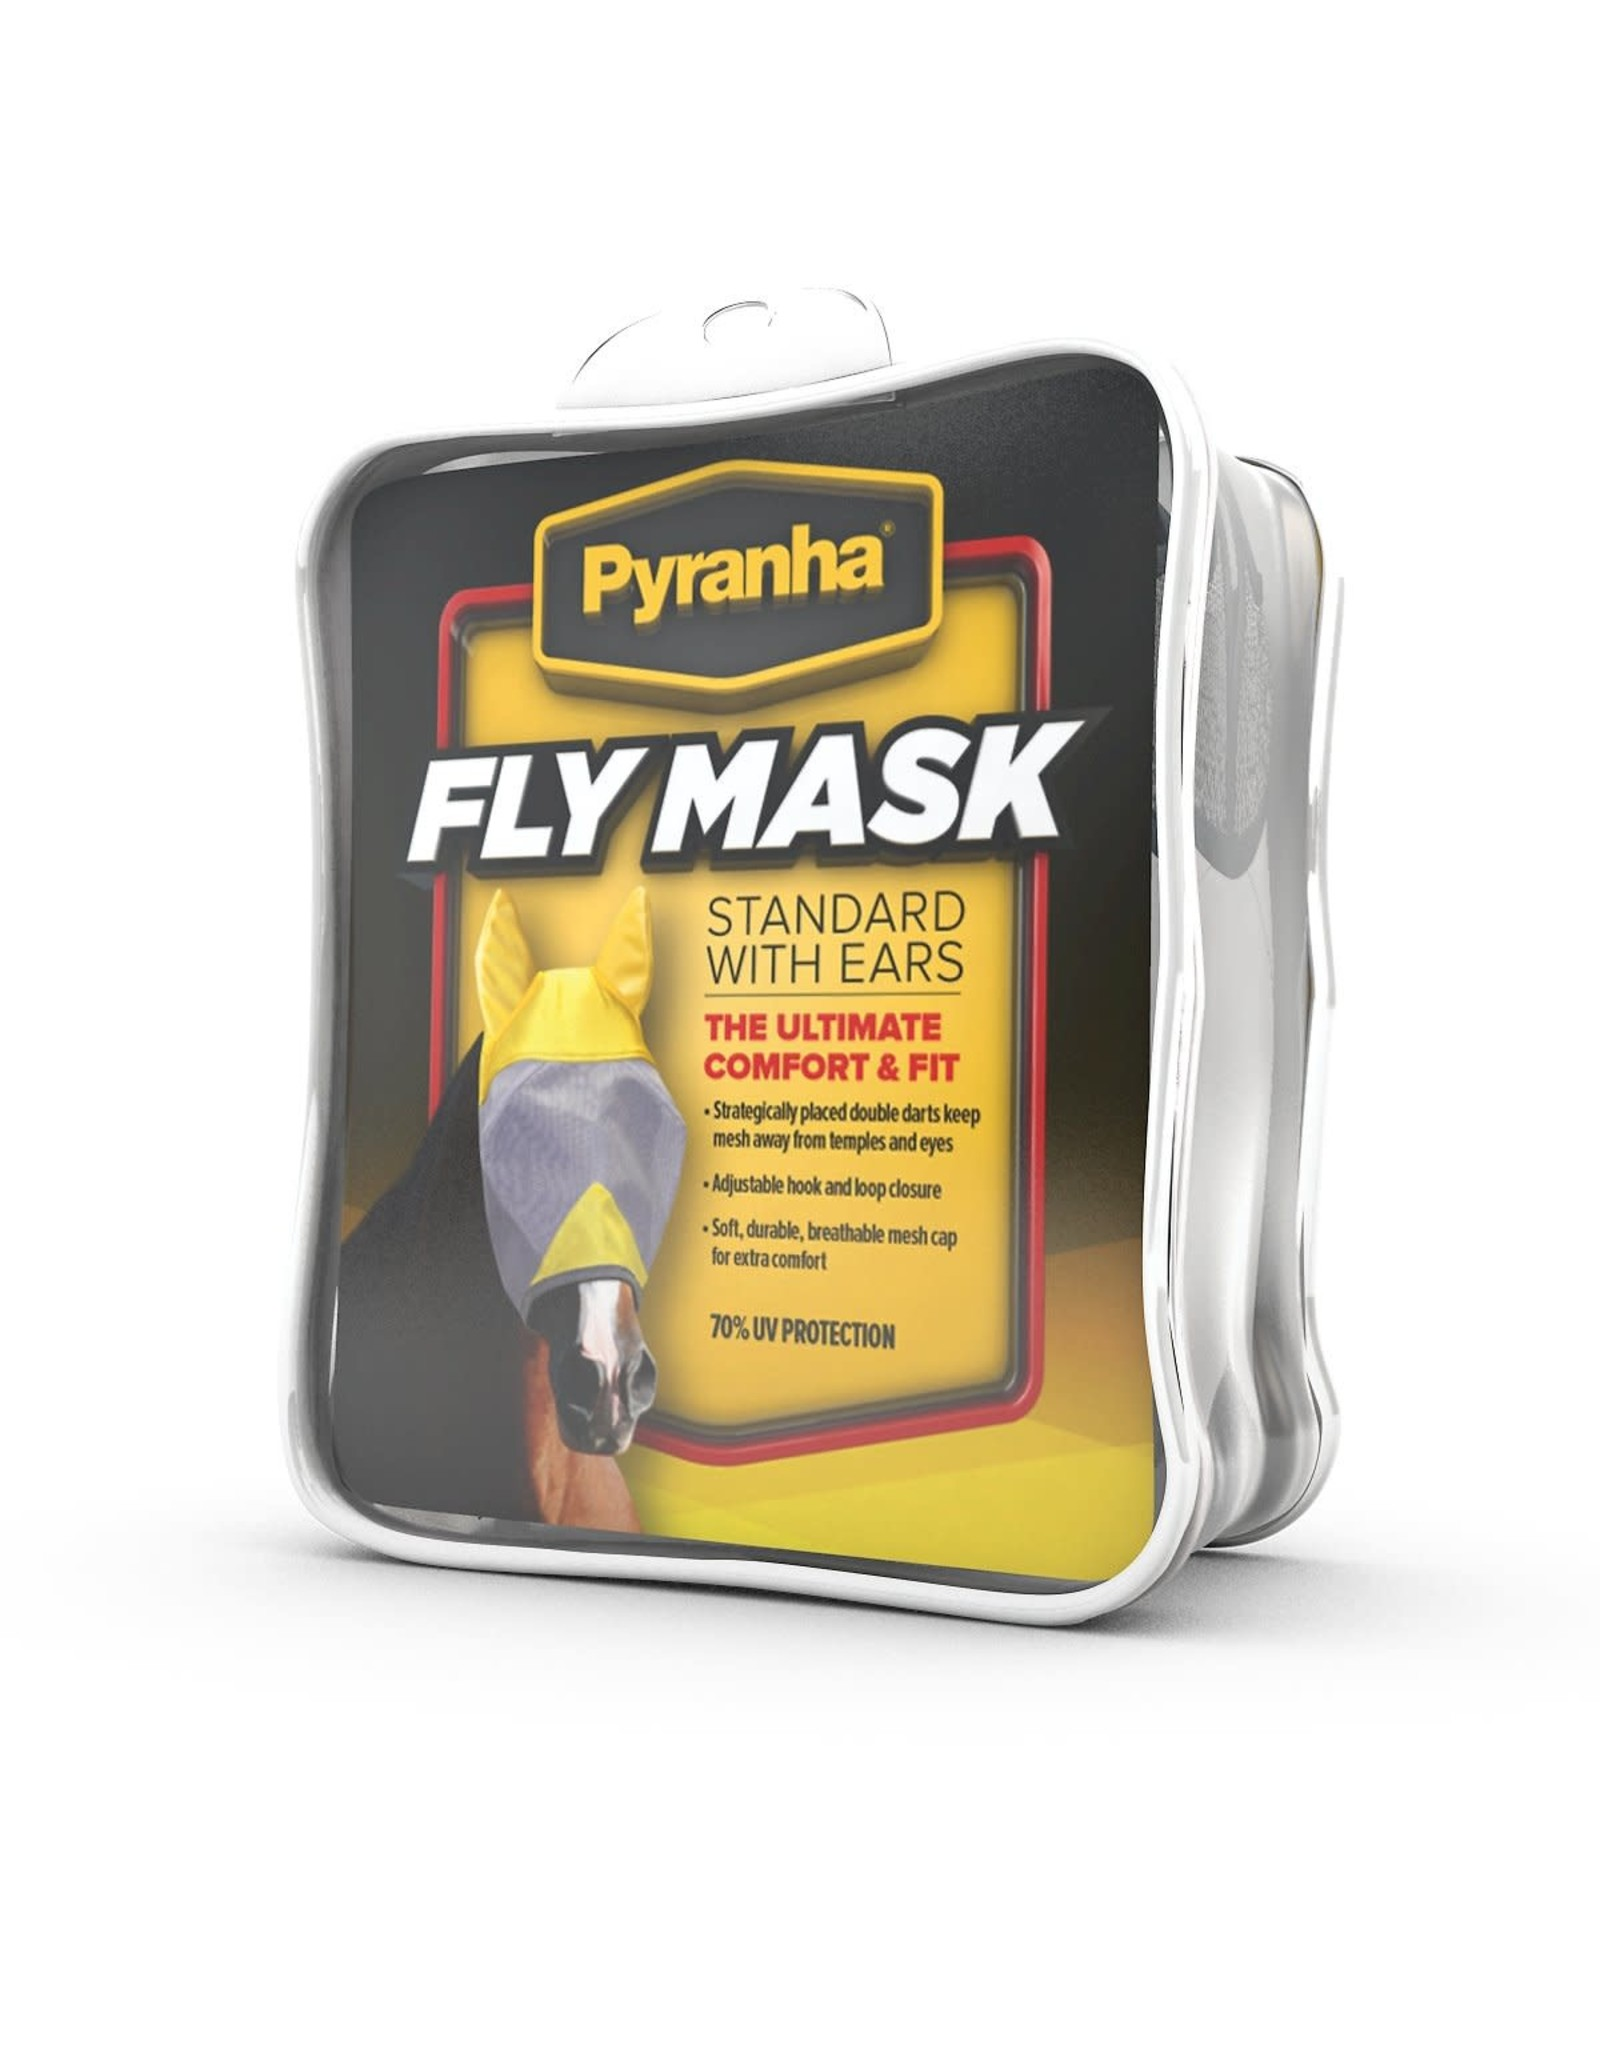 Pyranha Fly Mask w/ Ears